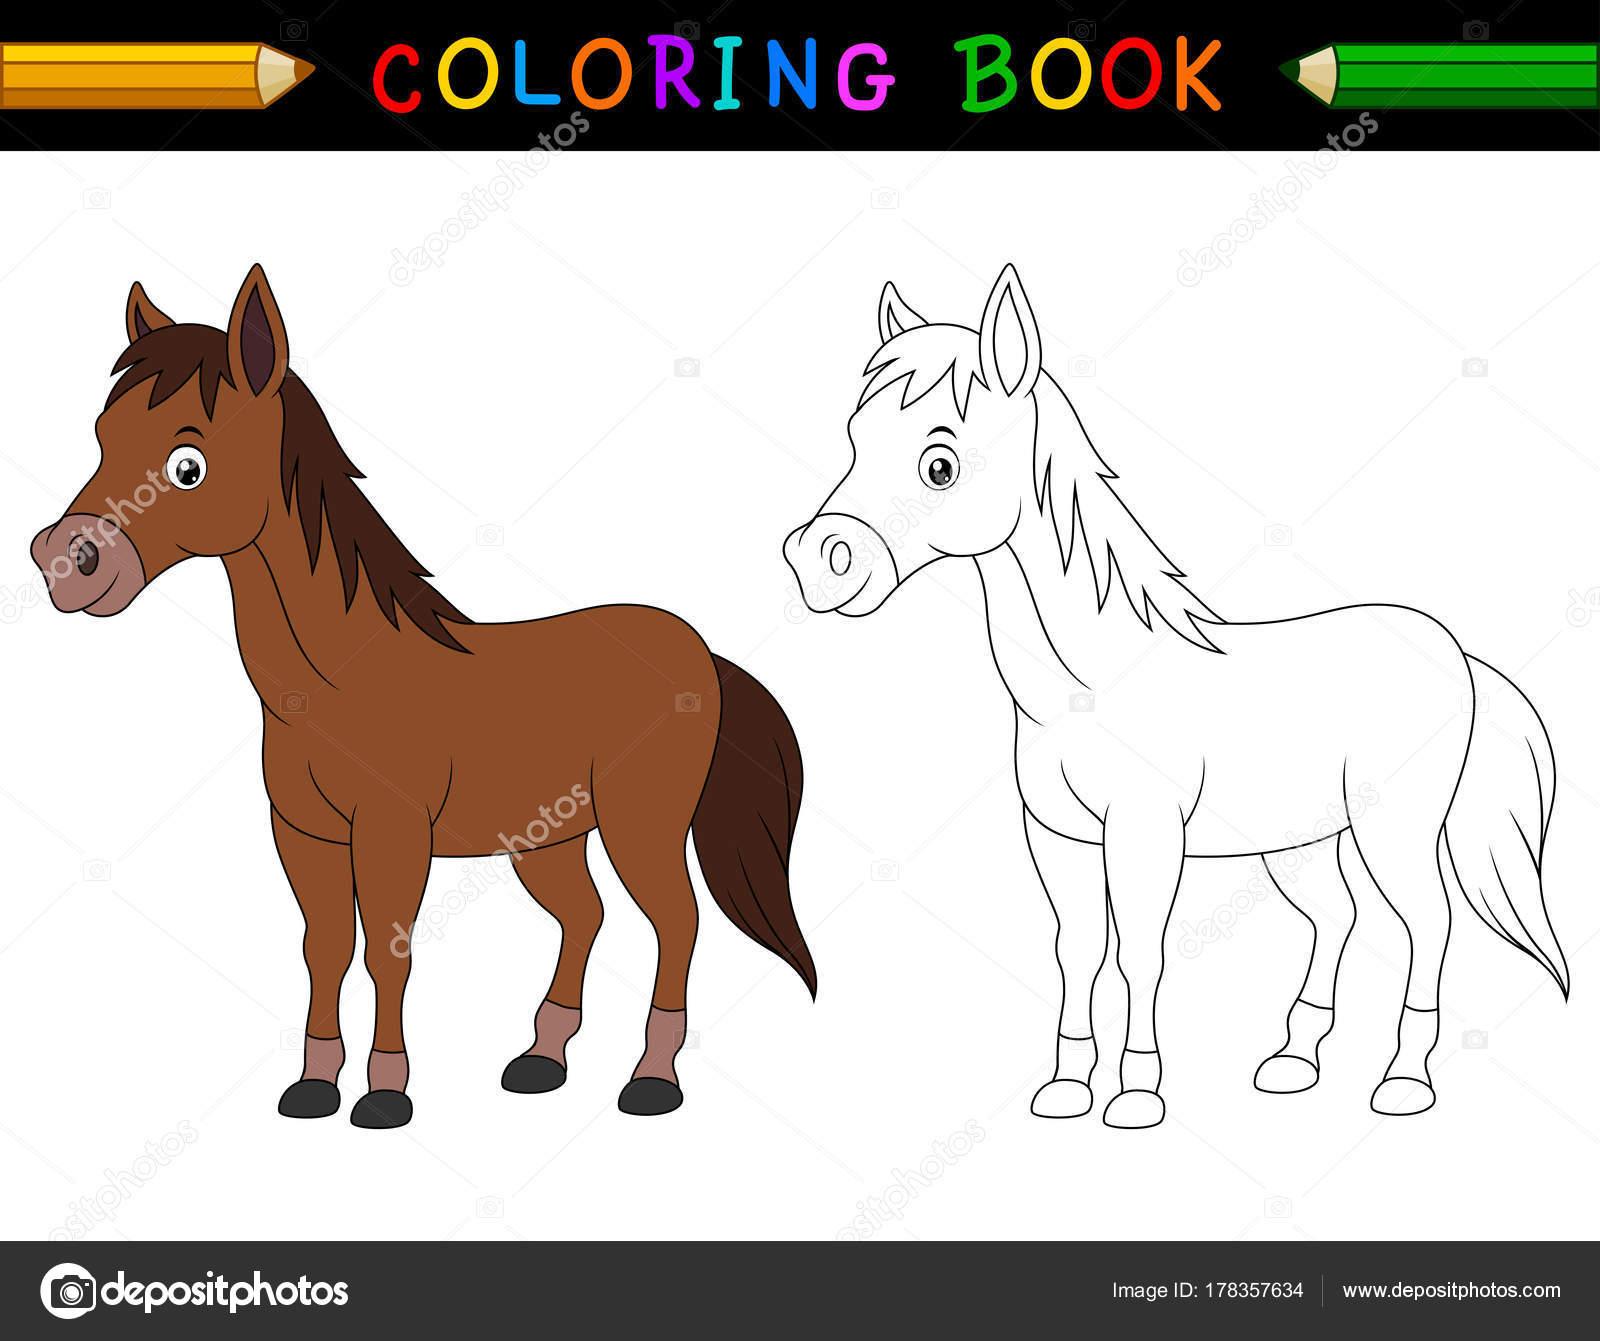 Libro Para Colorear Dibujos Animados Caballo — Archivo Imágenes ...